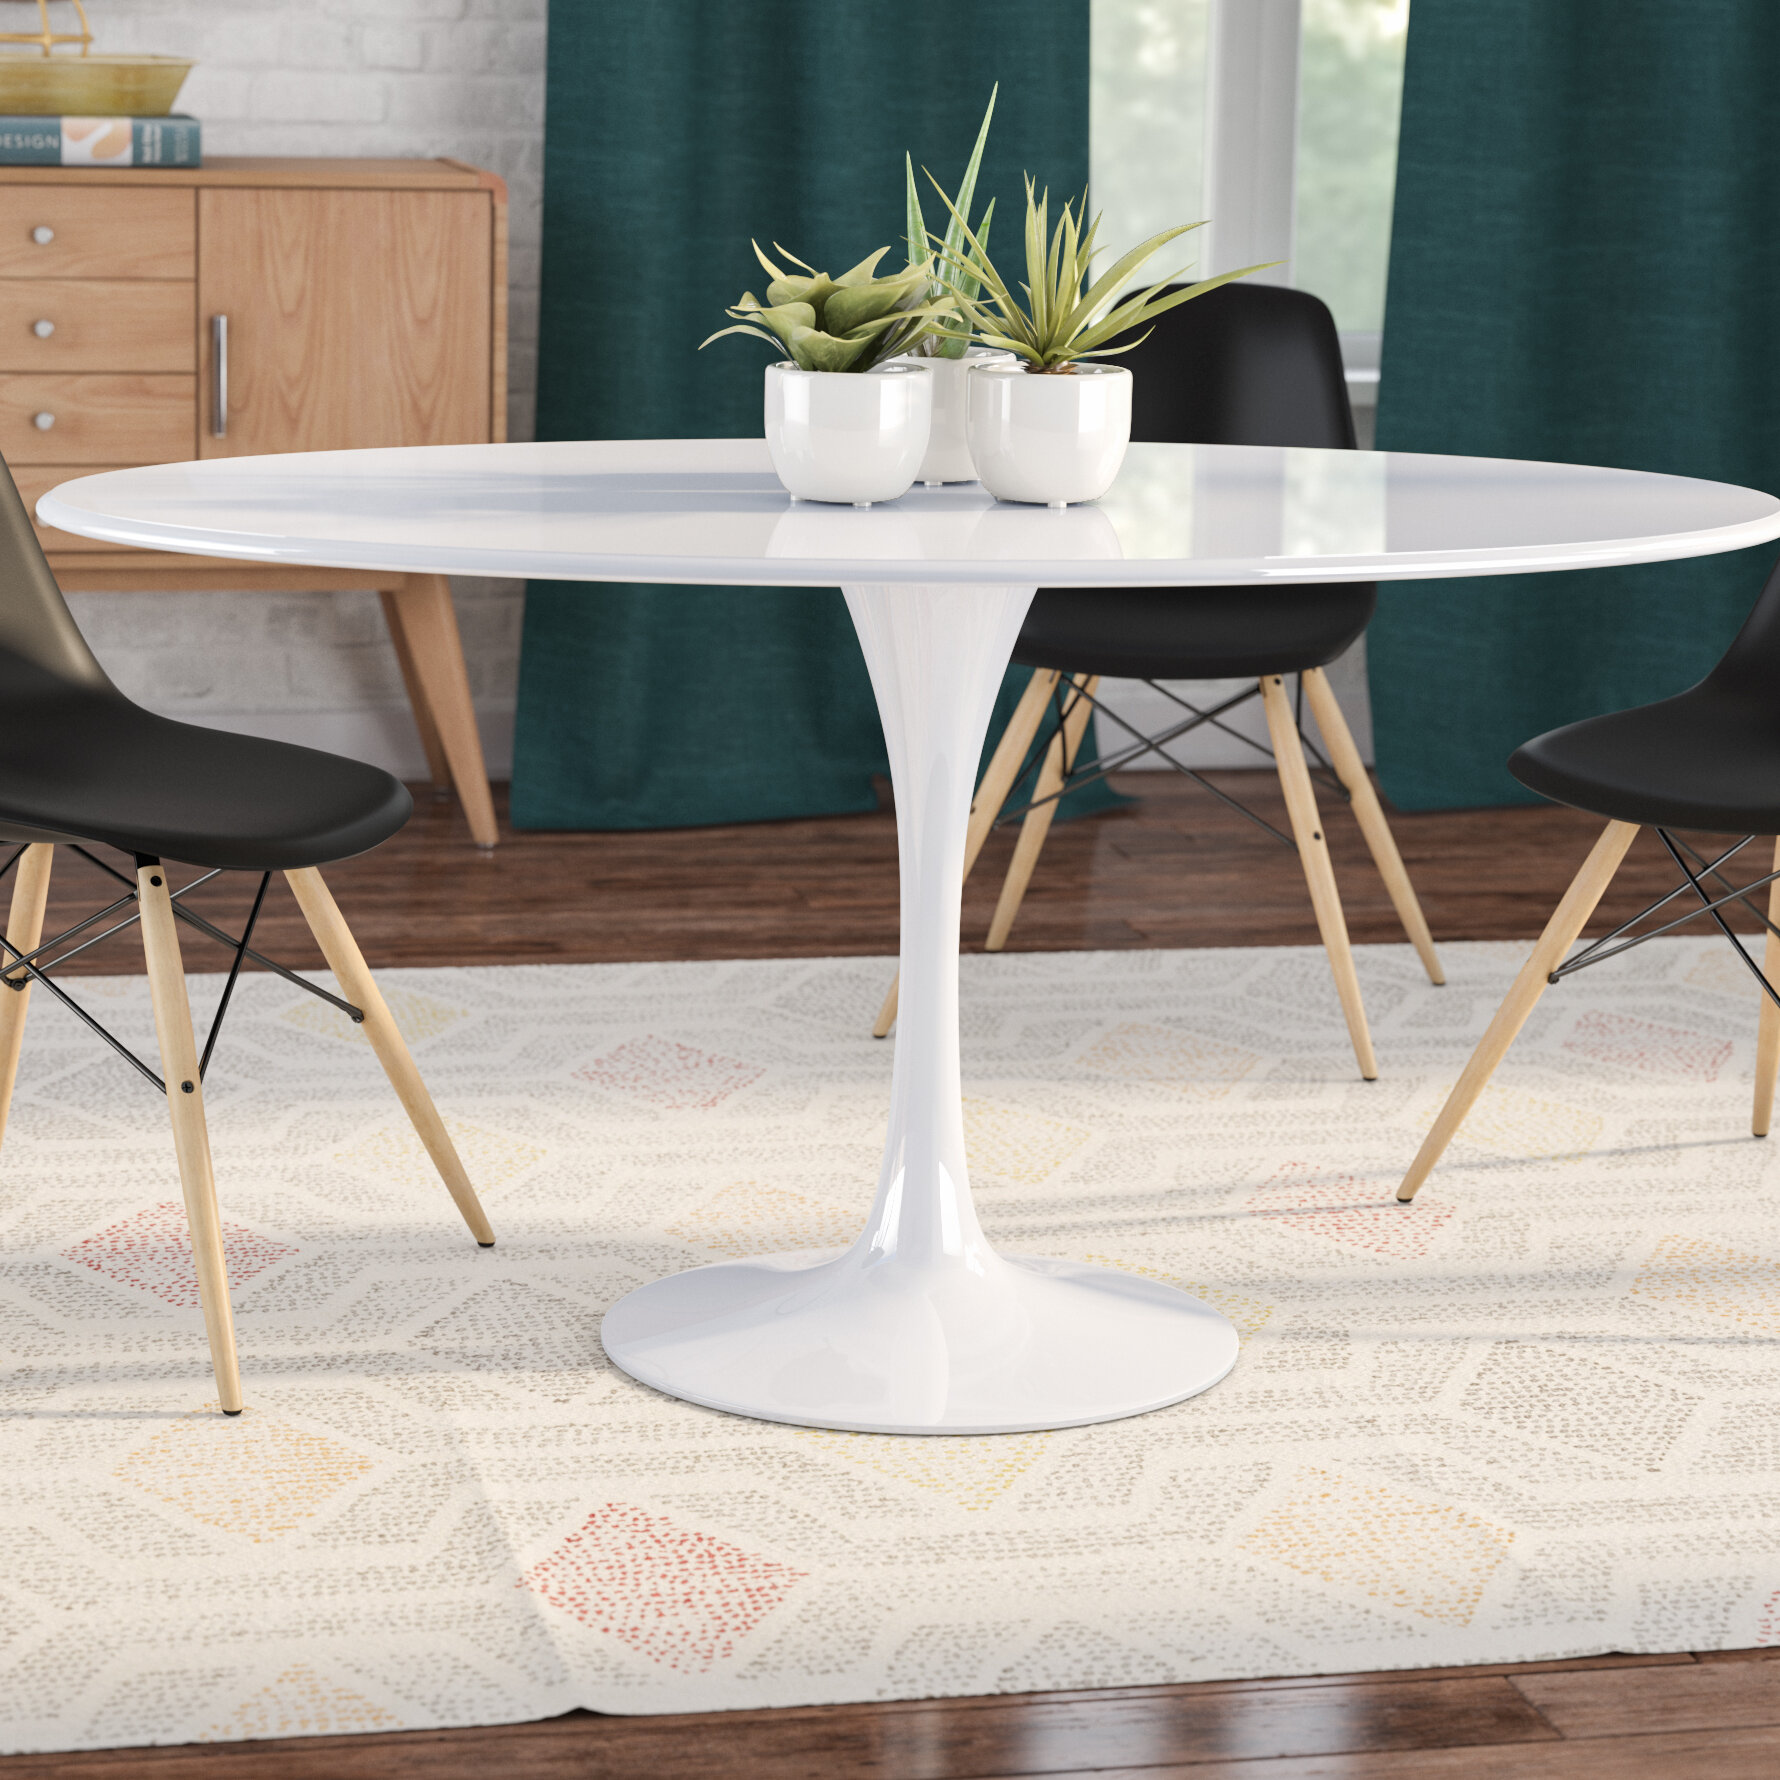 Langley street julien oval dining table reviews wayfair